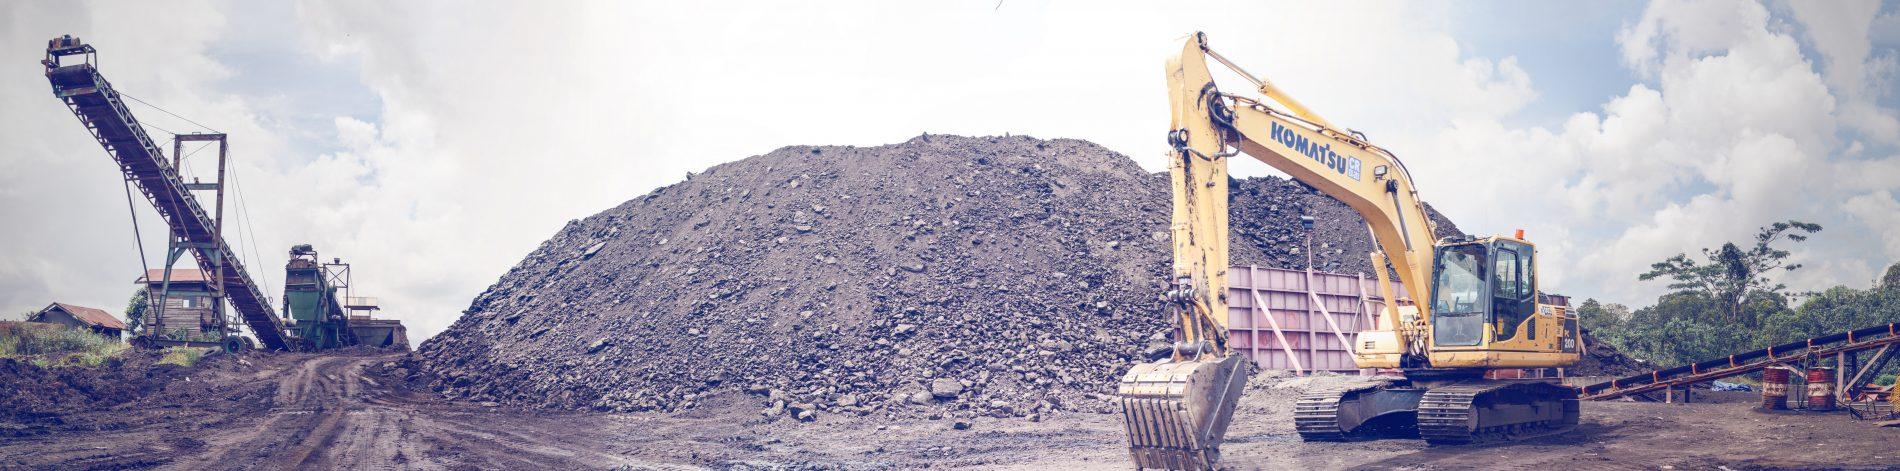 komat'su excavator and conveyor belt